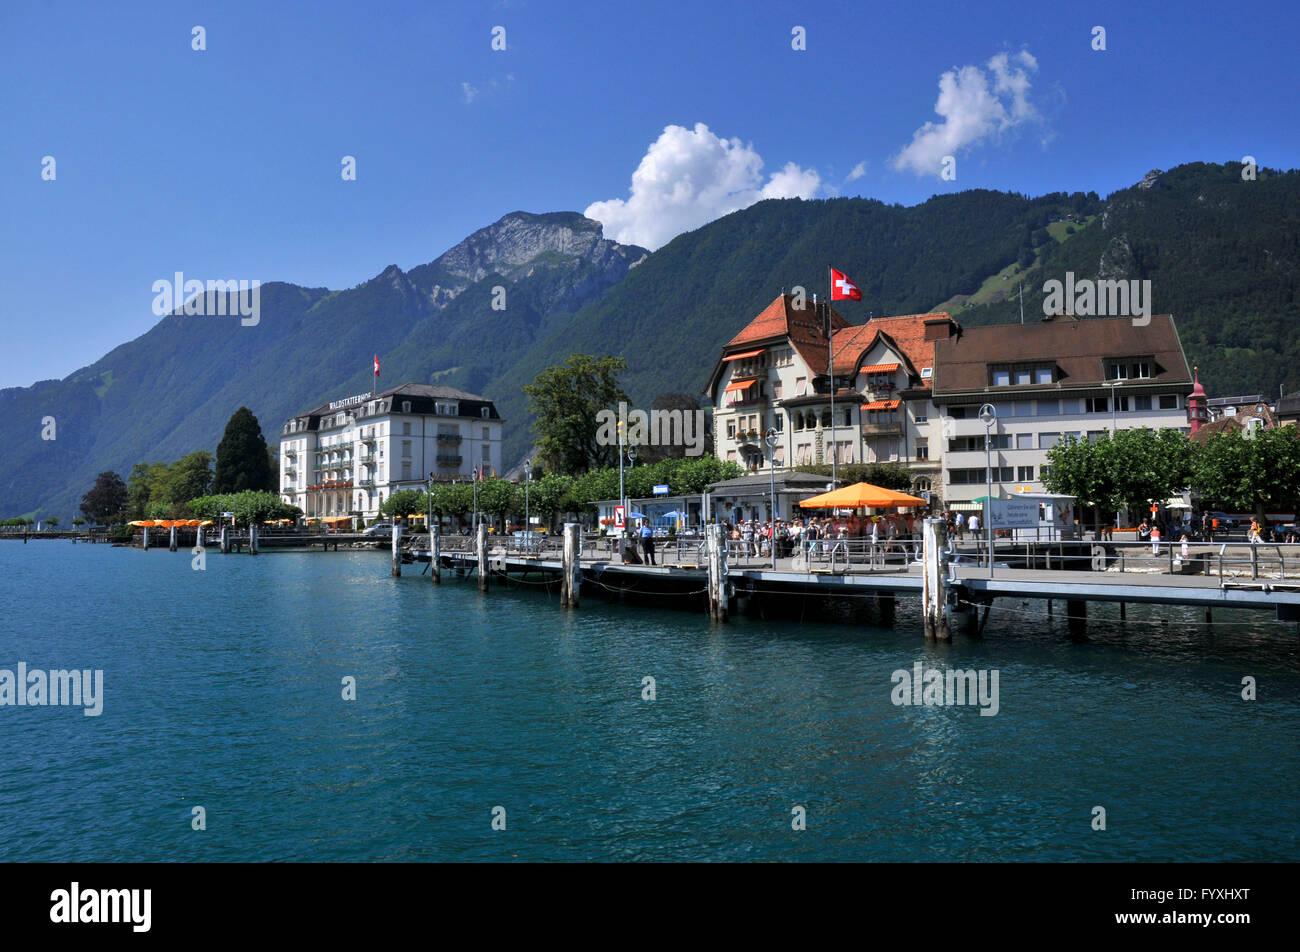 Canton Of Schwyz Stock Photos Canton Of Schwyz Stock Images Alamy